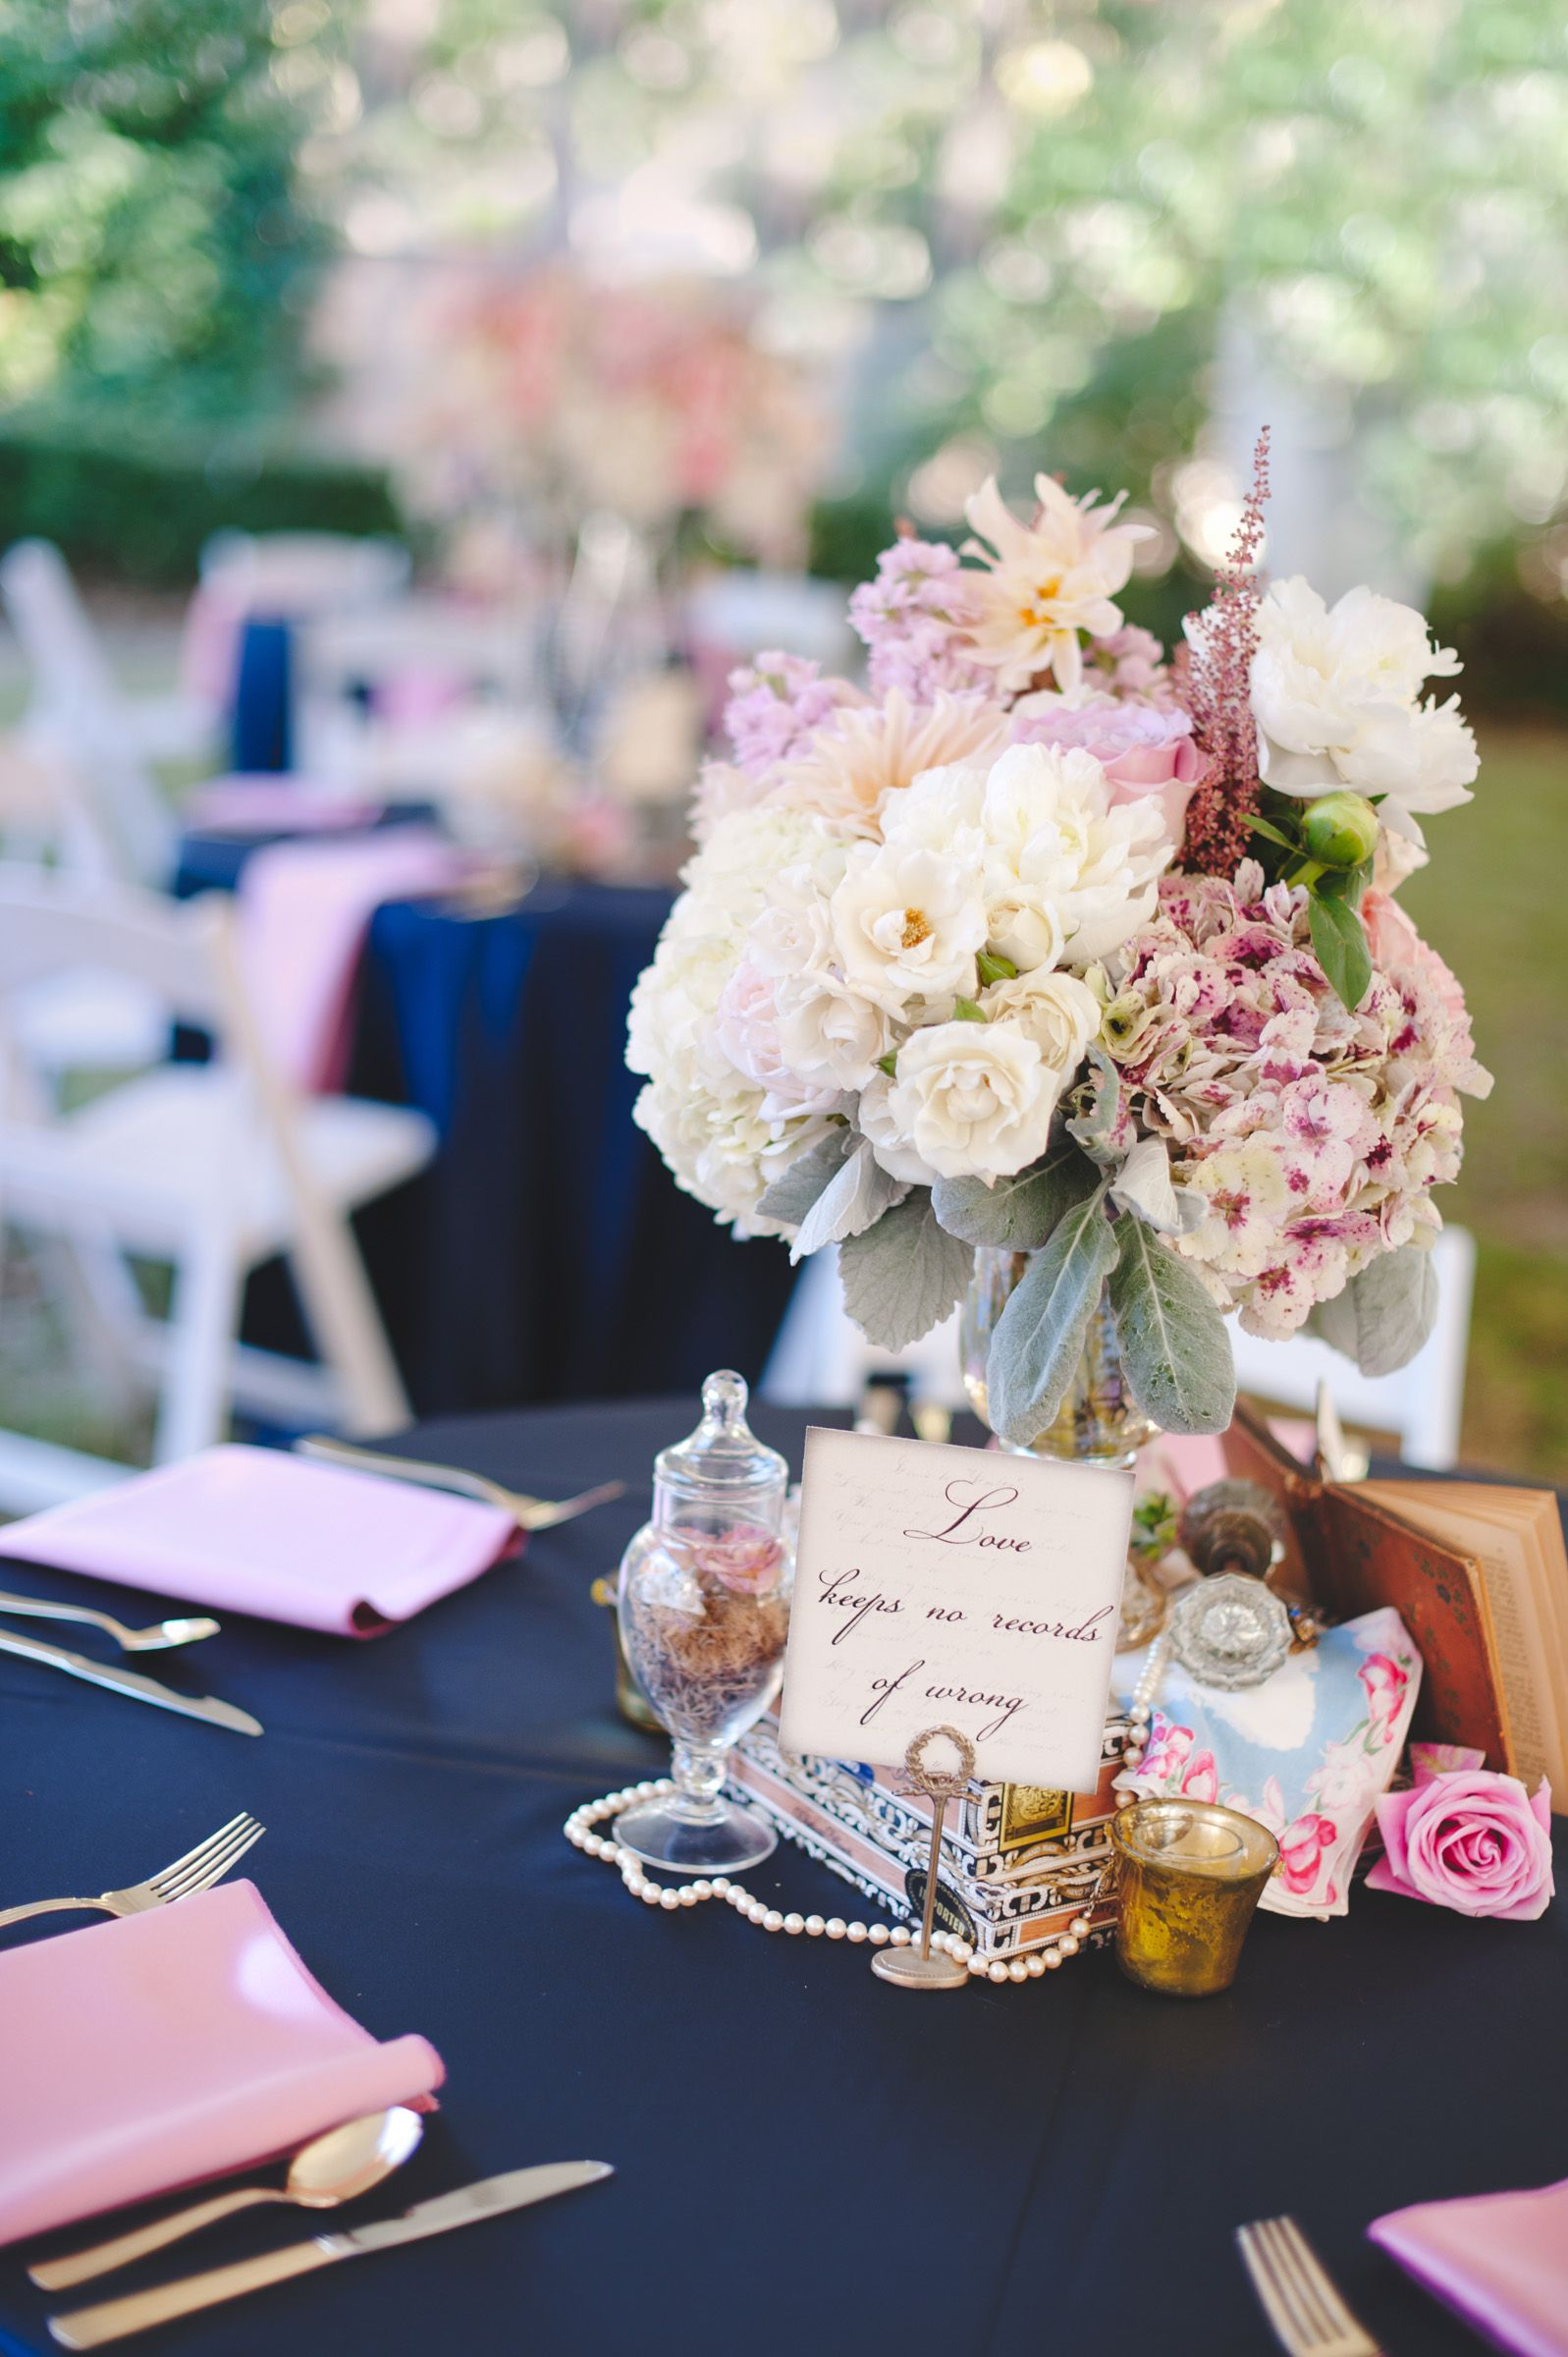 Romantic Pink Blue Vintage Aldredge House Wedding Vintage One Of A Kind Table Vintage Table Decor Vintage Wedding Props Vintage Rentals Wedding Decorations